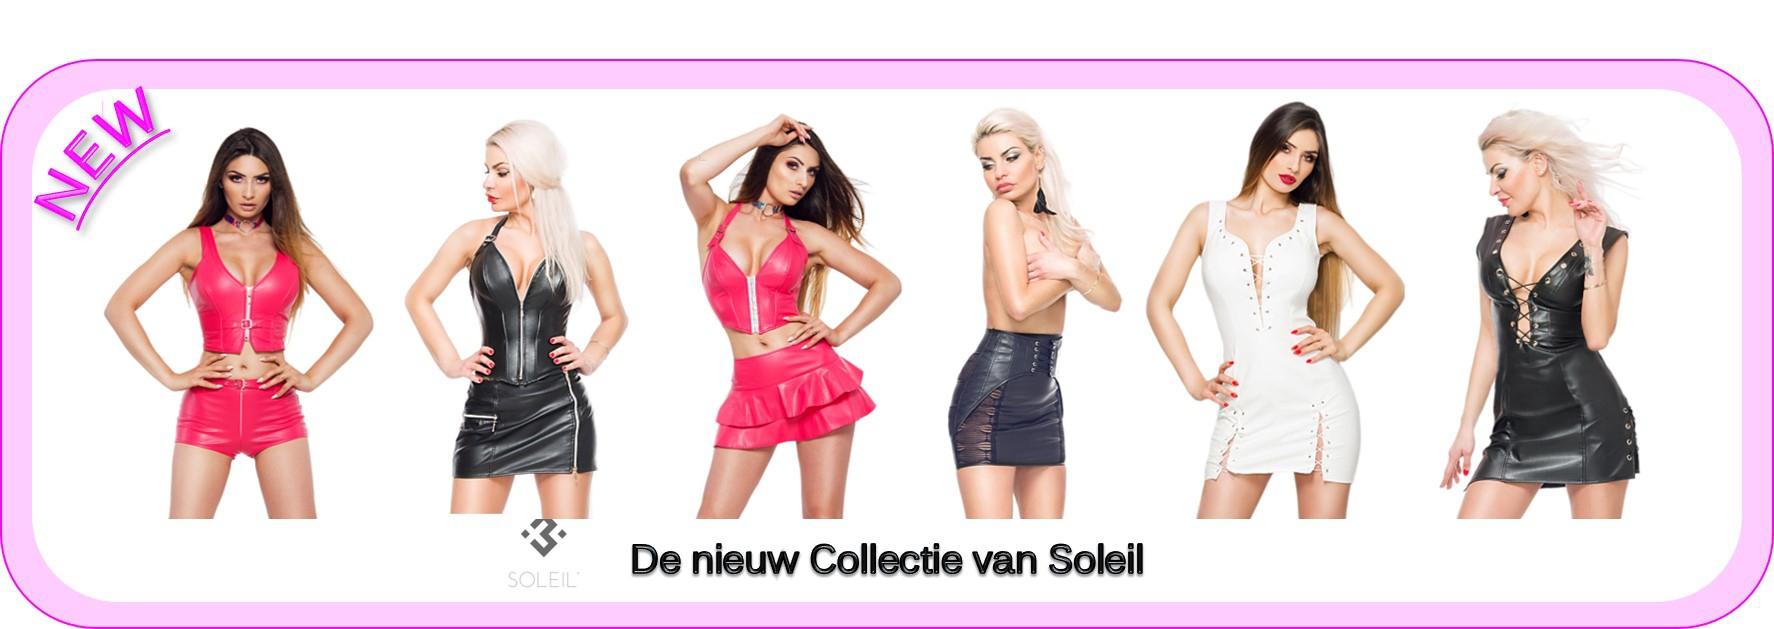 Nieuw Collectie XXX-Soleil